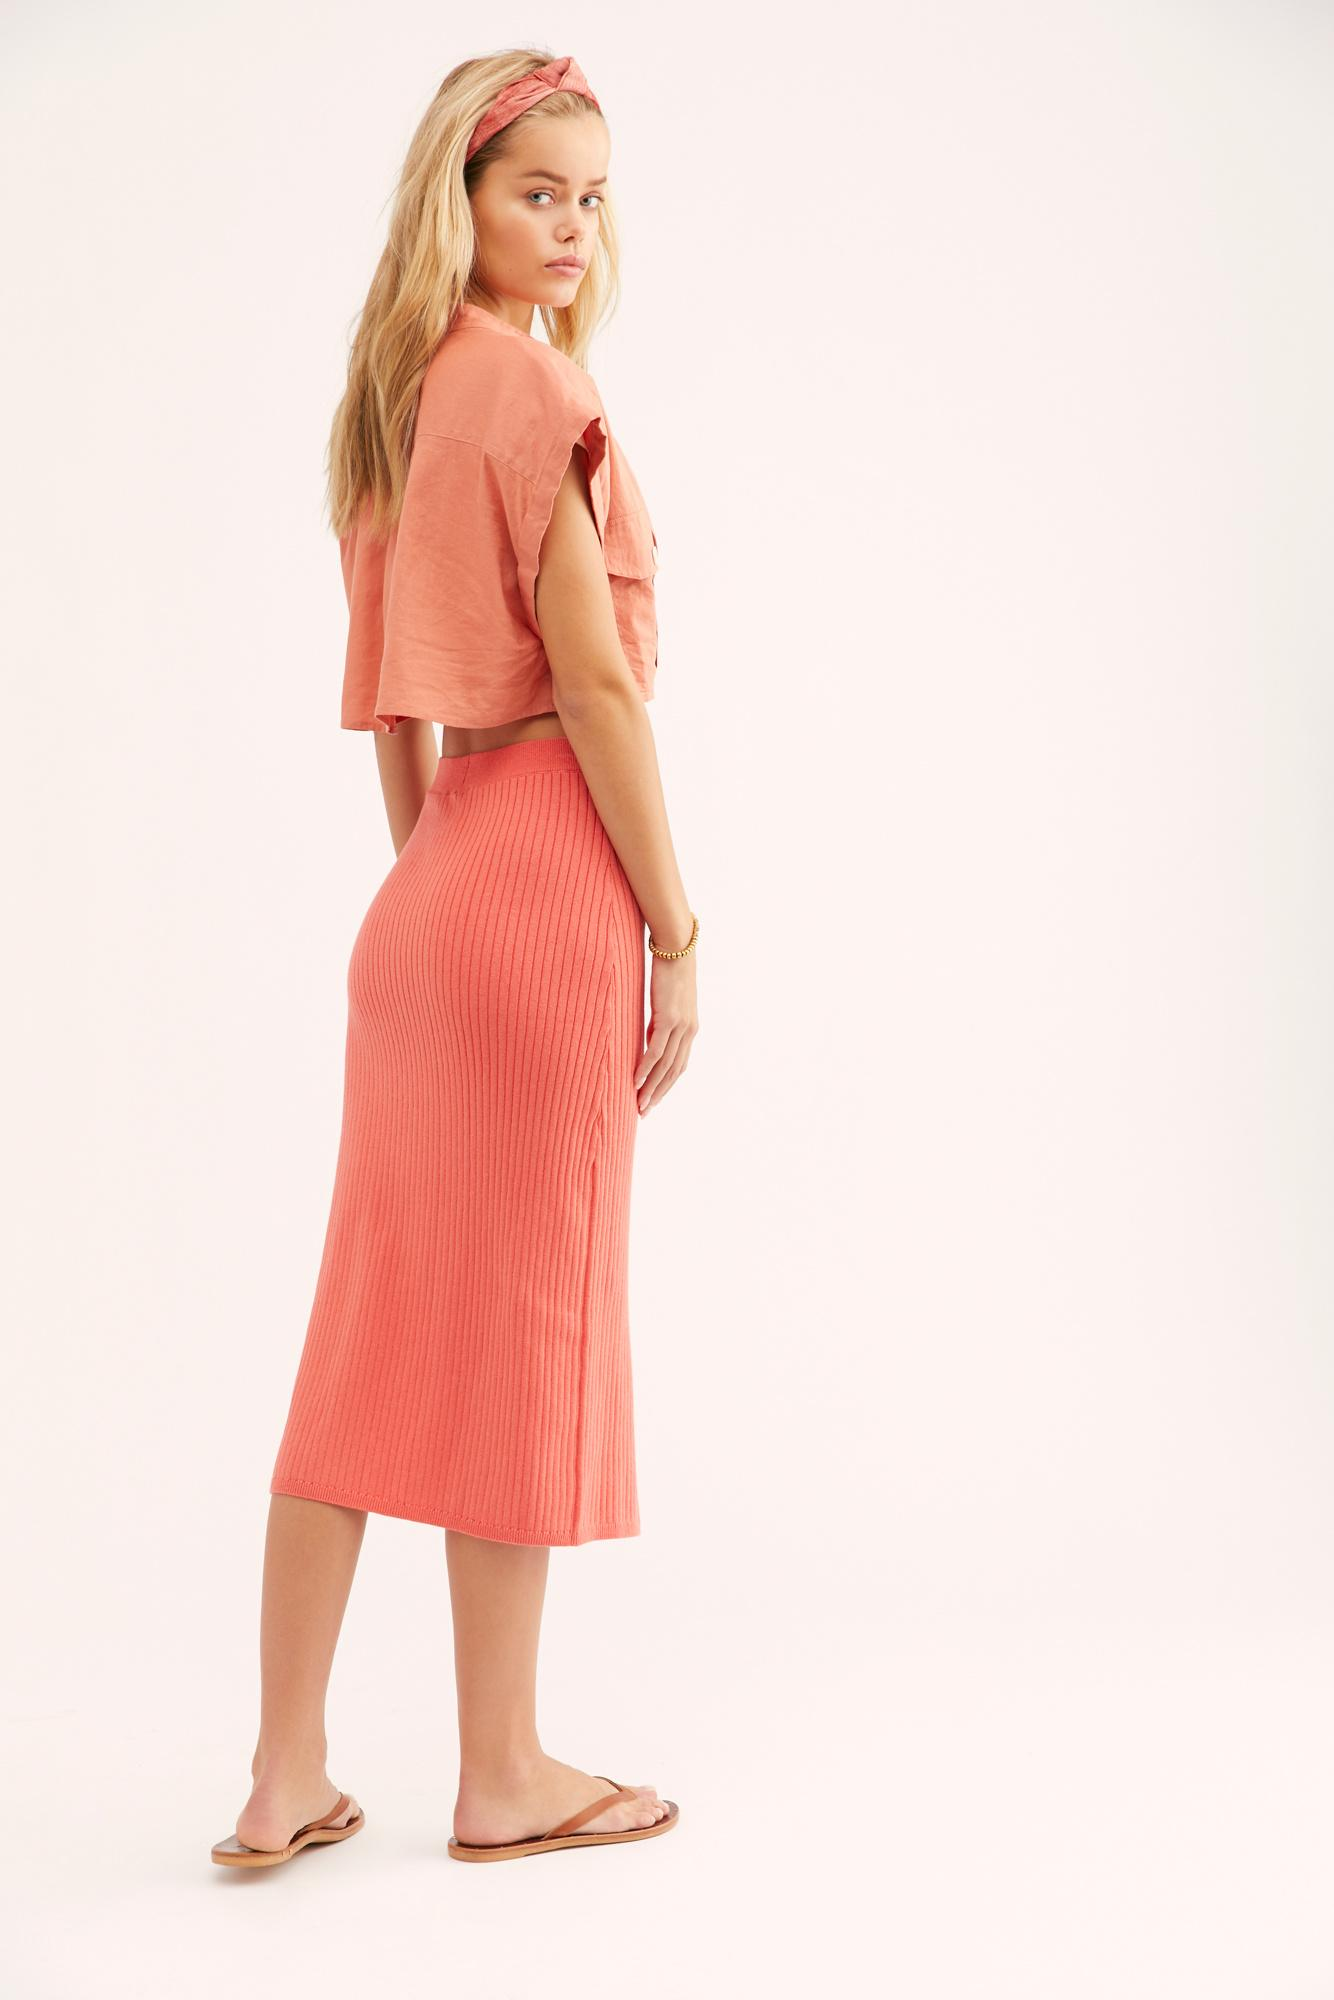 6a0aace5c54b9 Free People - Pink Skyline Midi Skirt - Lyst. View fullscreen